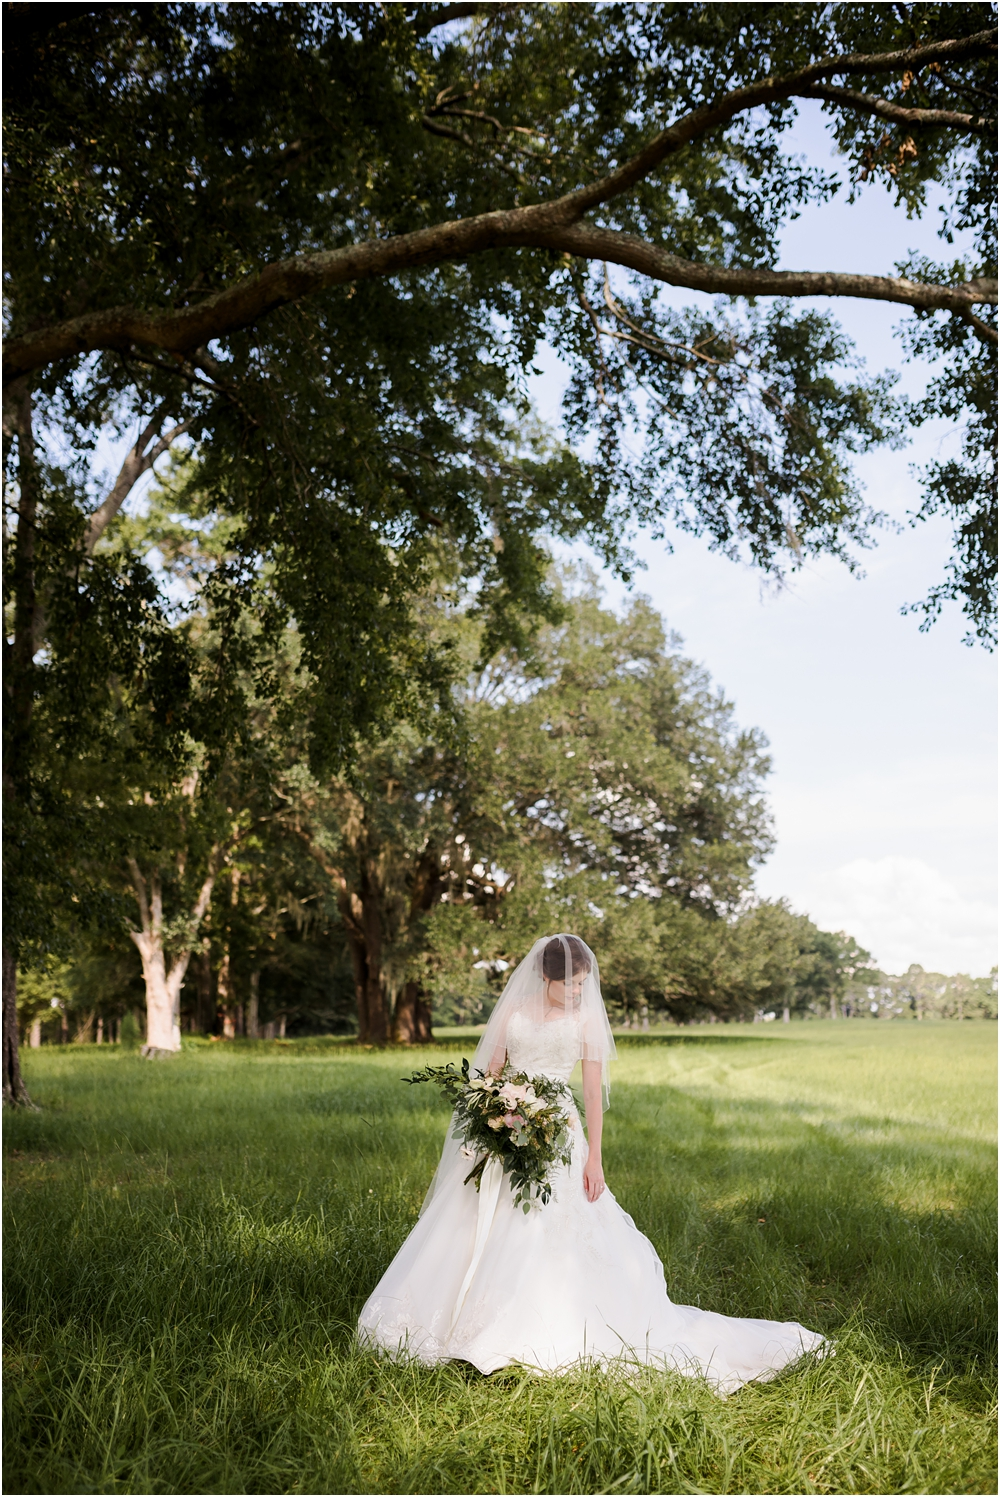 marianna-florida-wedding-photographer-kiersten-grant-41.jpg